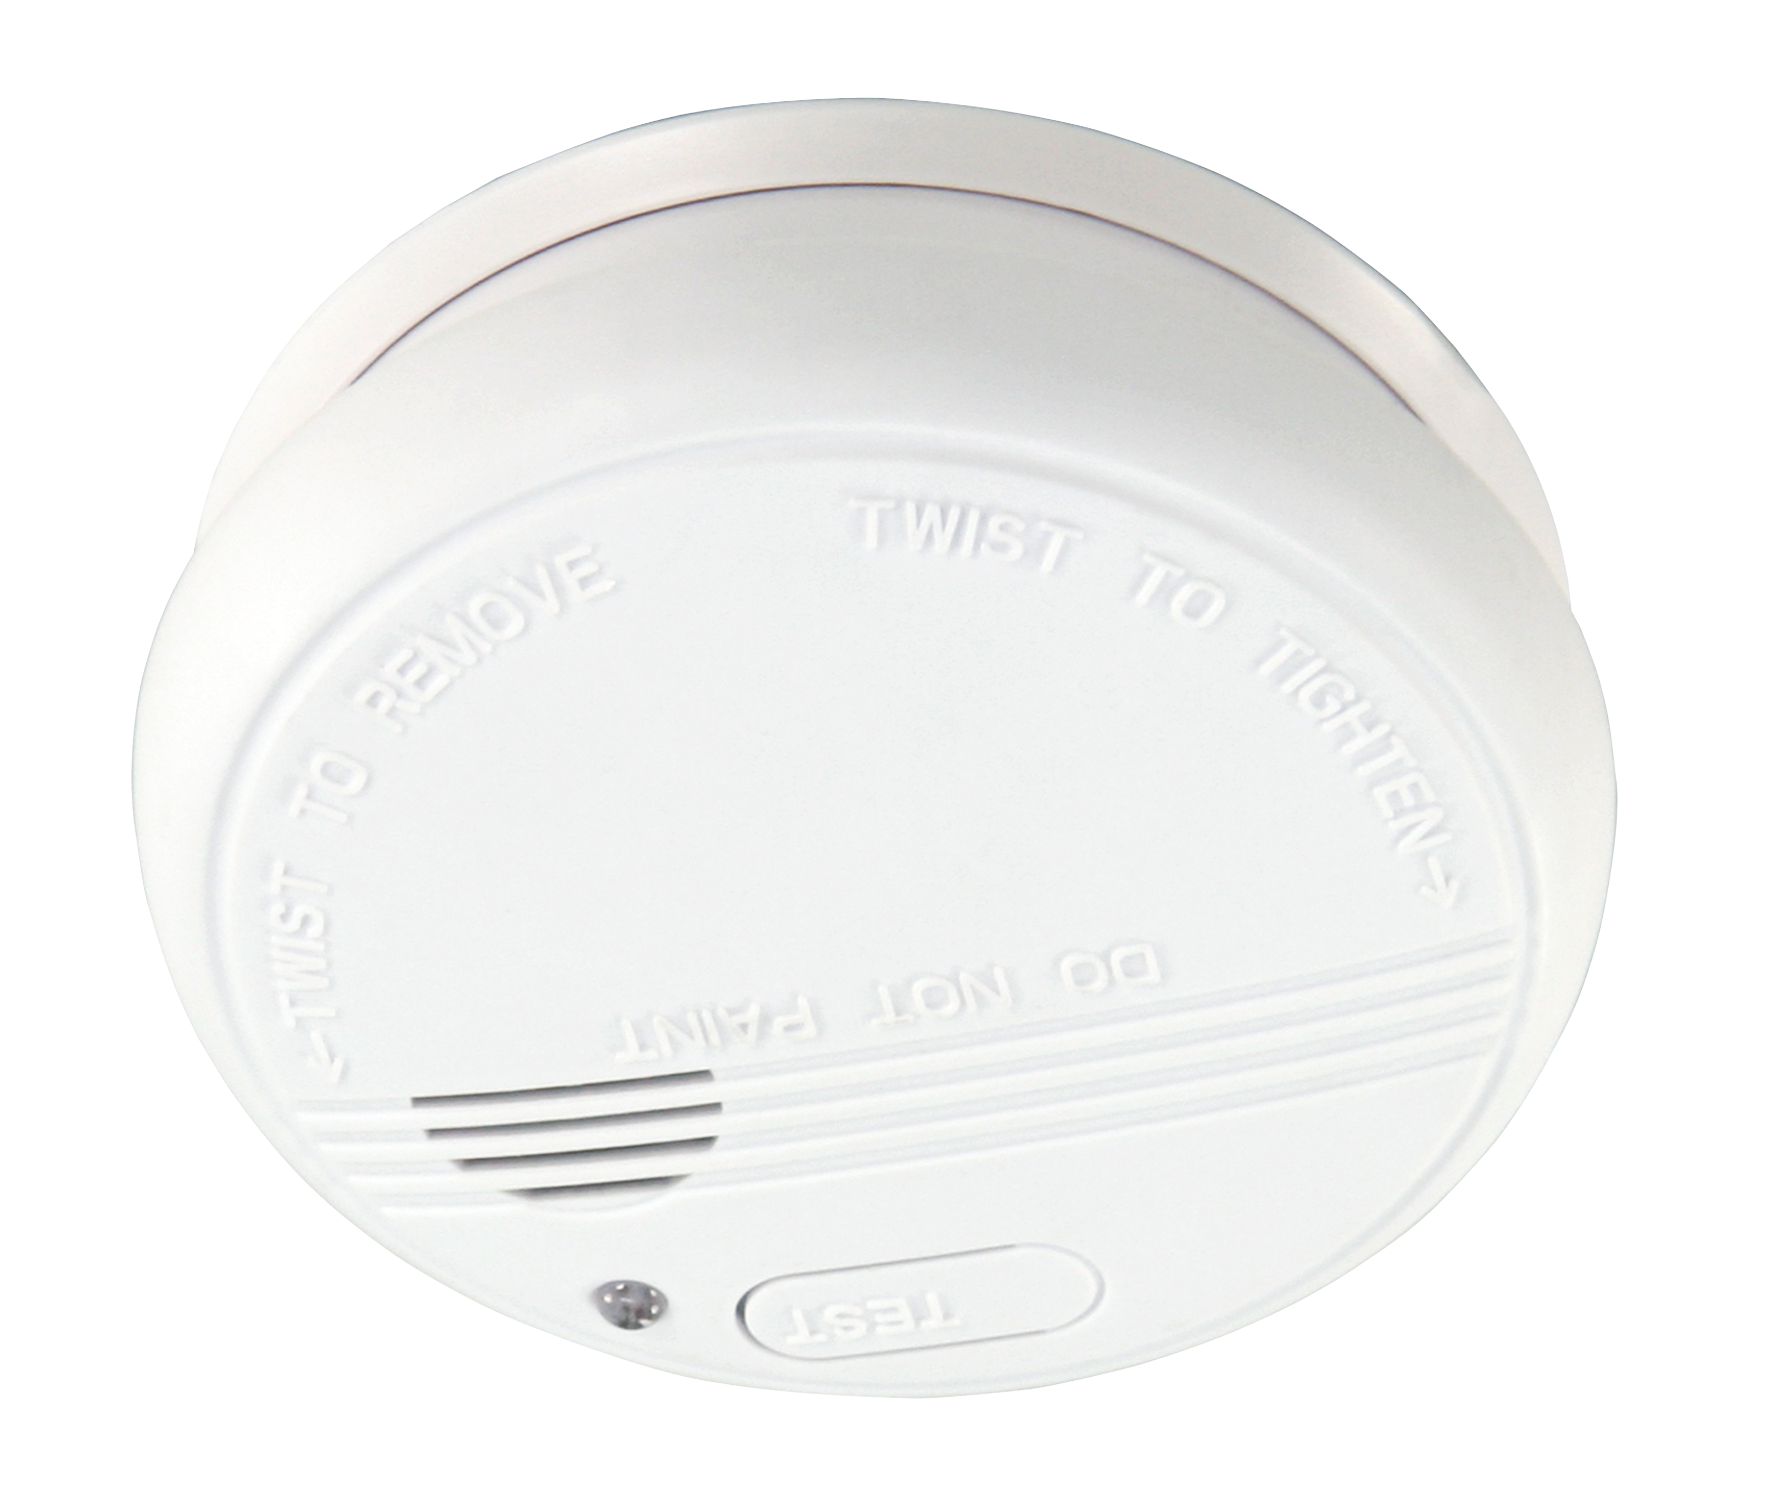 Rauchmelder McPower ''KD-133A'', geprüft gemäß DIN EN14604